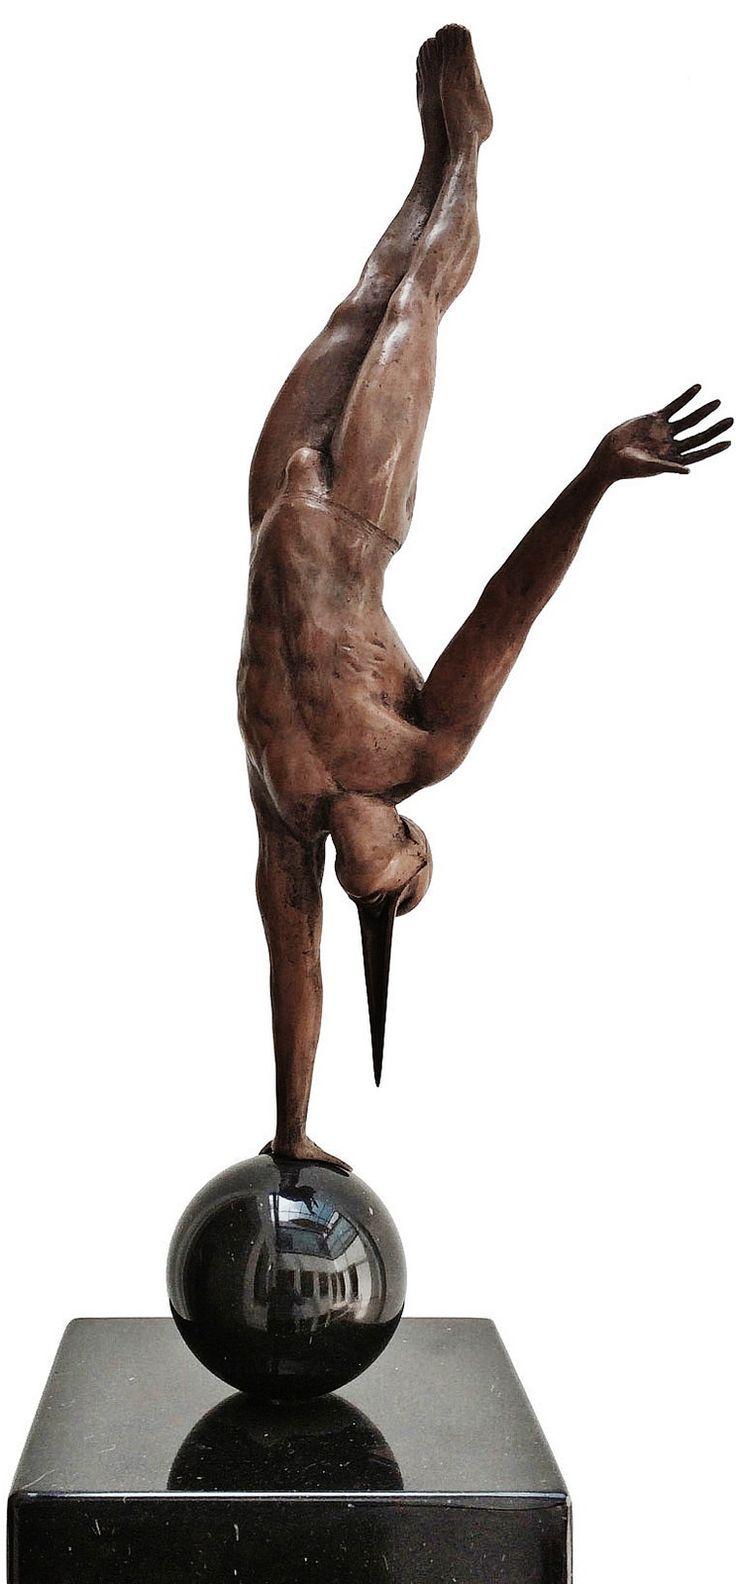 Sculpture - Jorge Marin